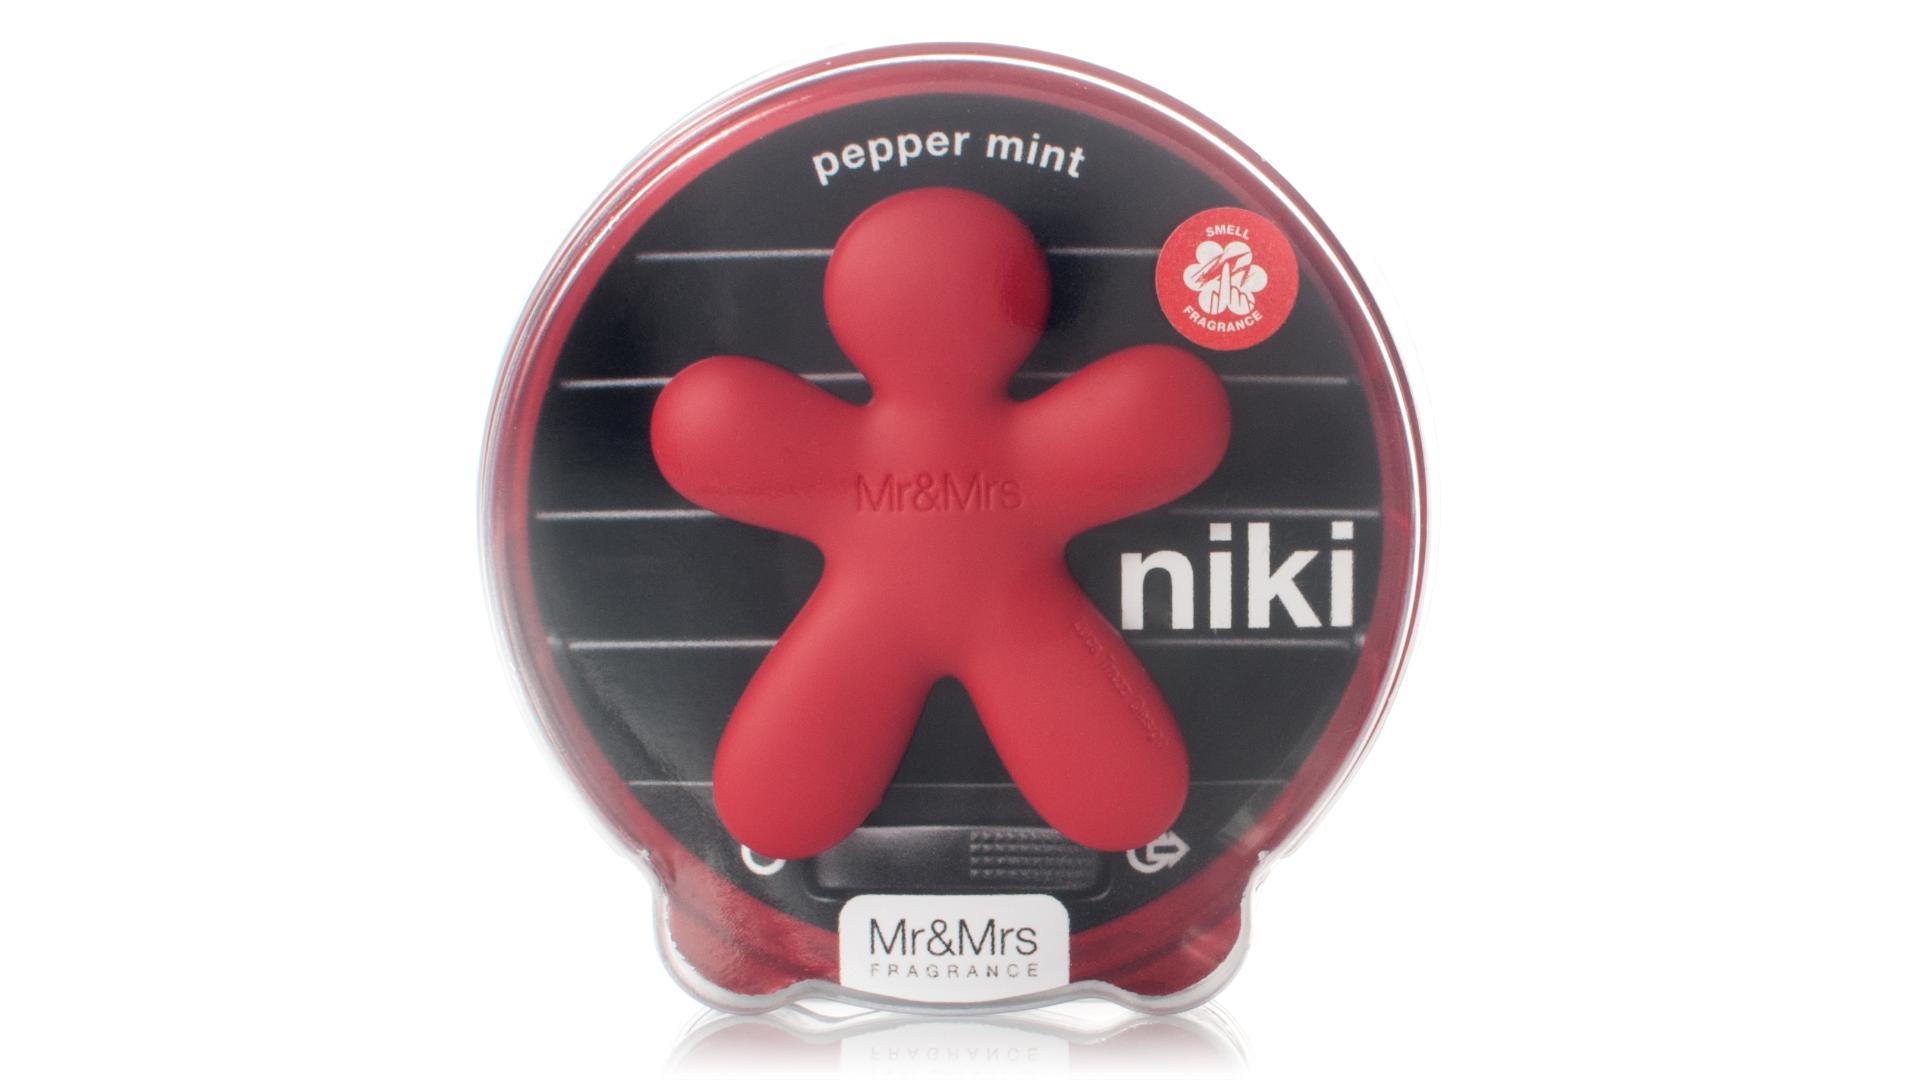 Mr&Mrs NIKI osviežovač vzduchu PEPPER MINT